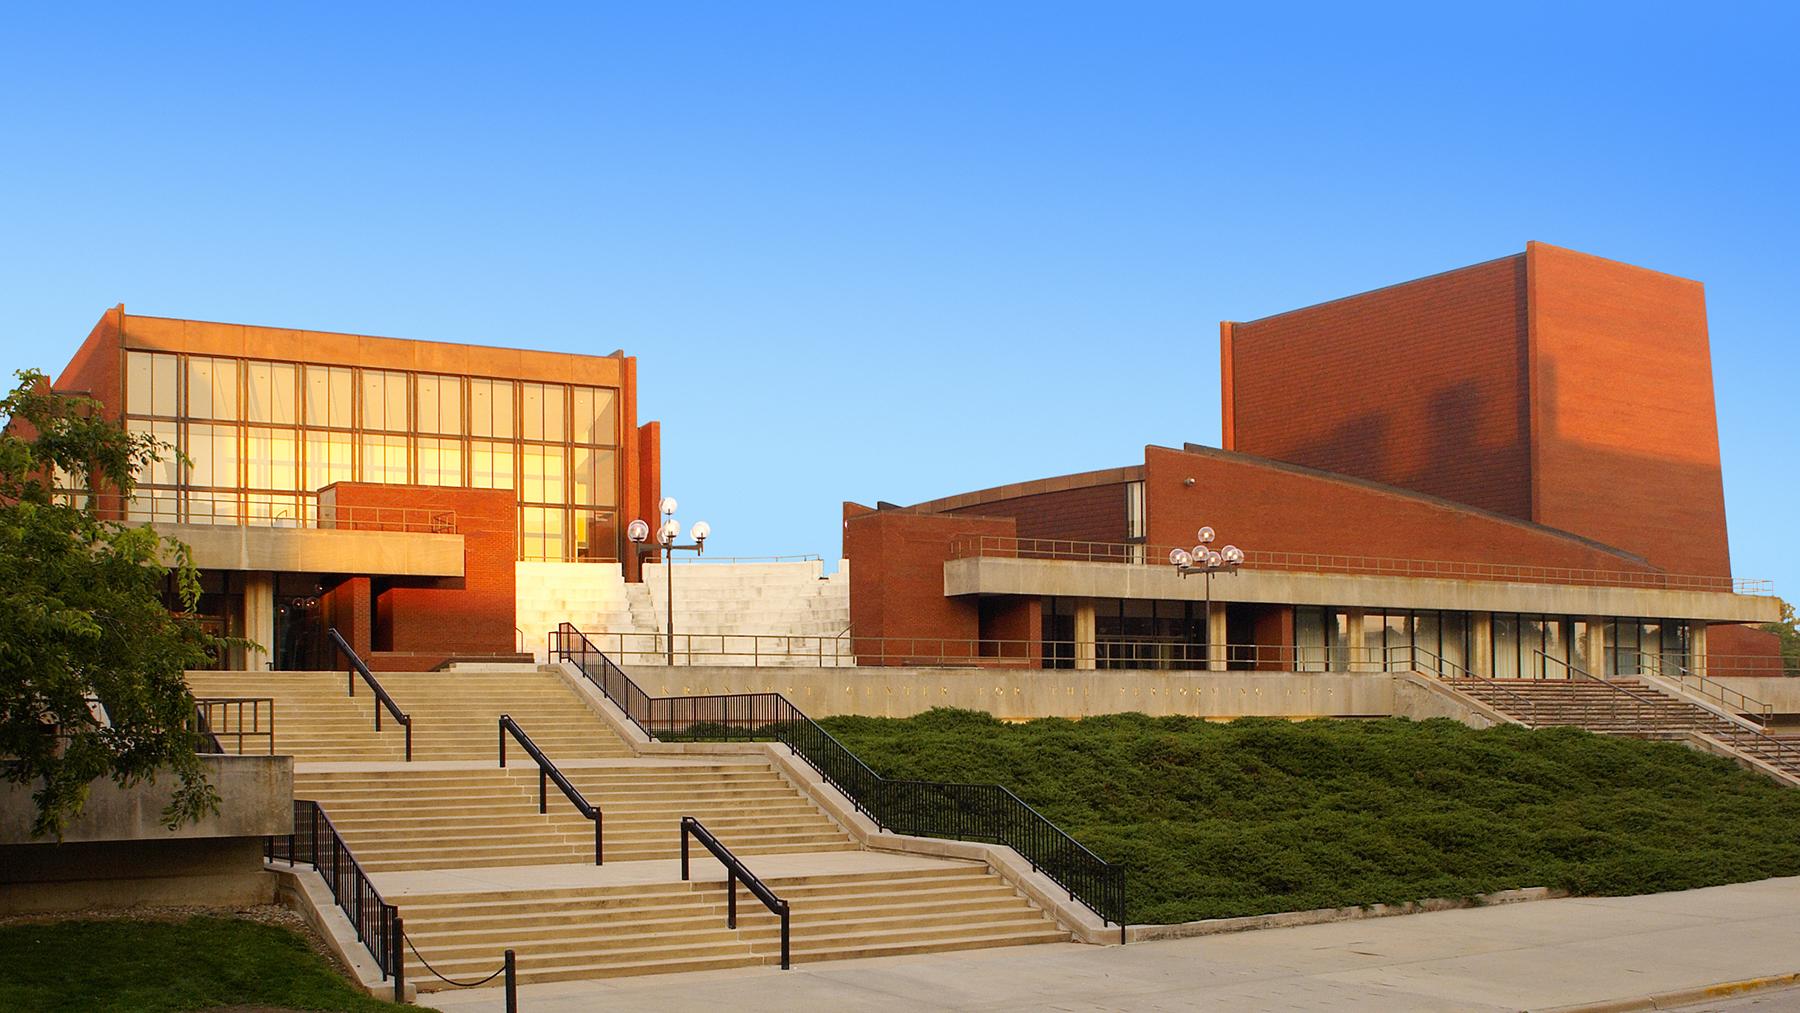 exterior of the Krannert Center for the Performing Arts in golden light